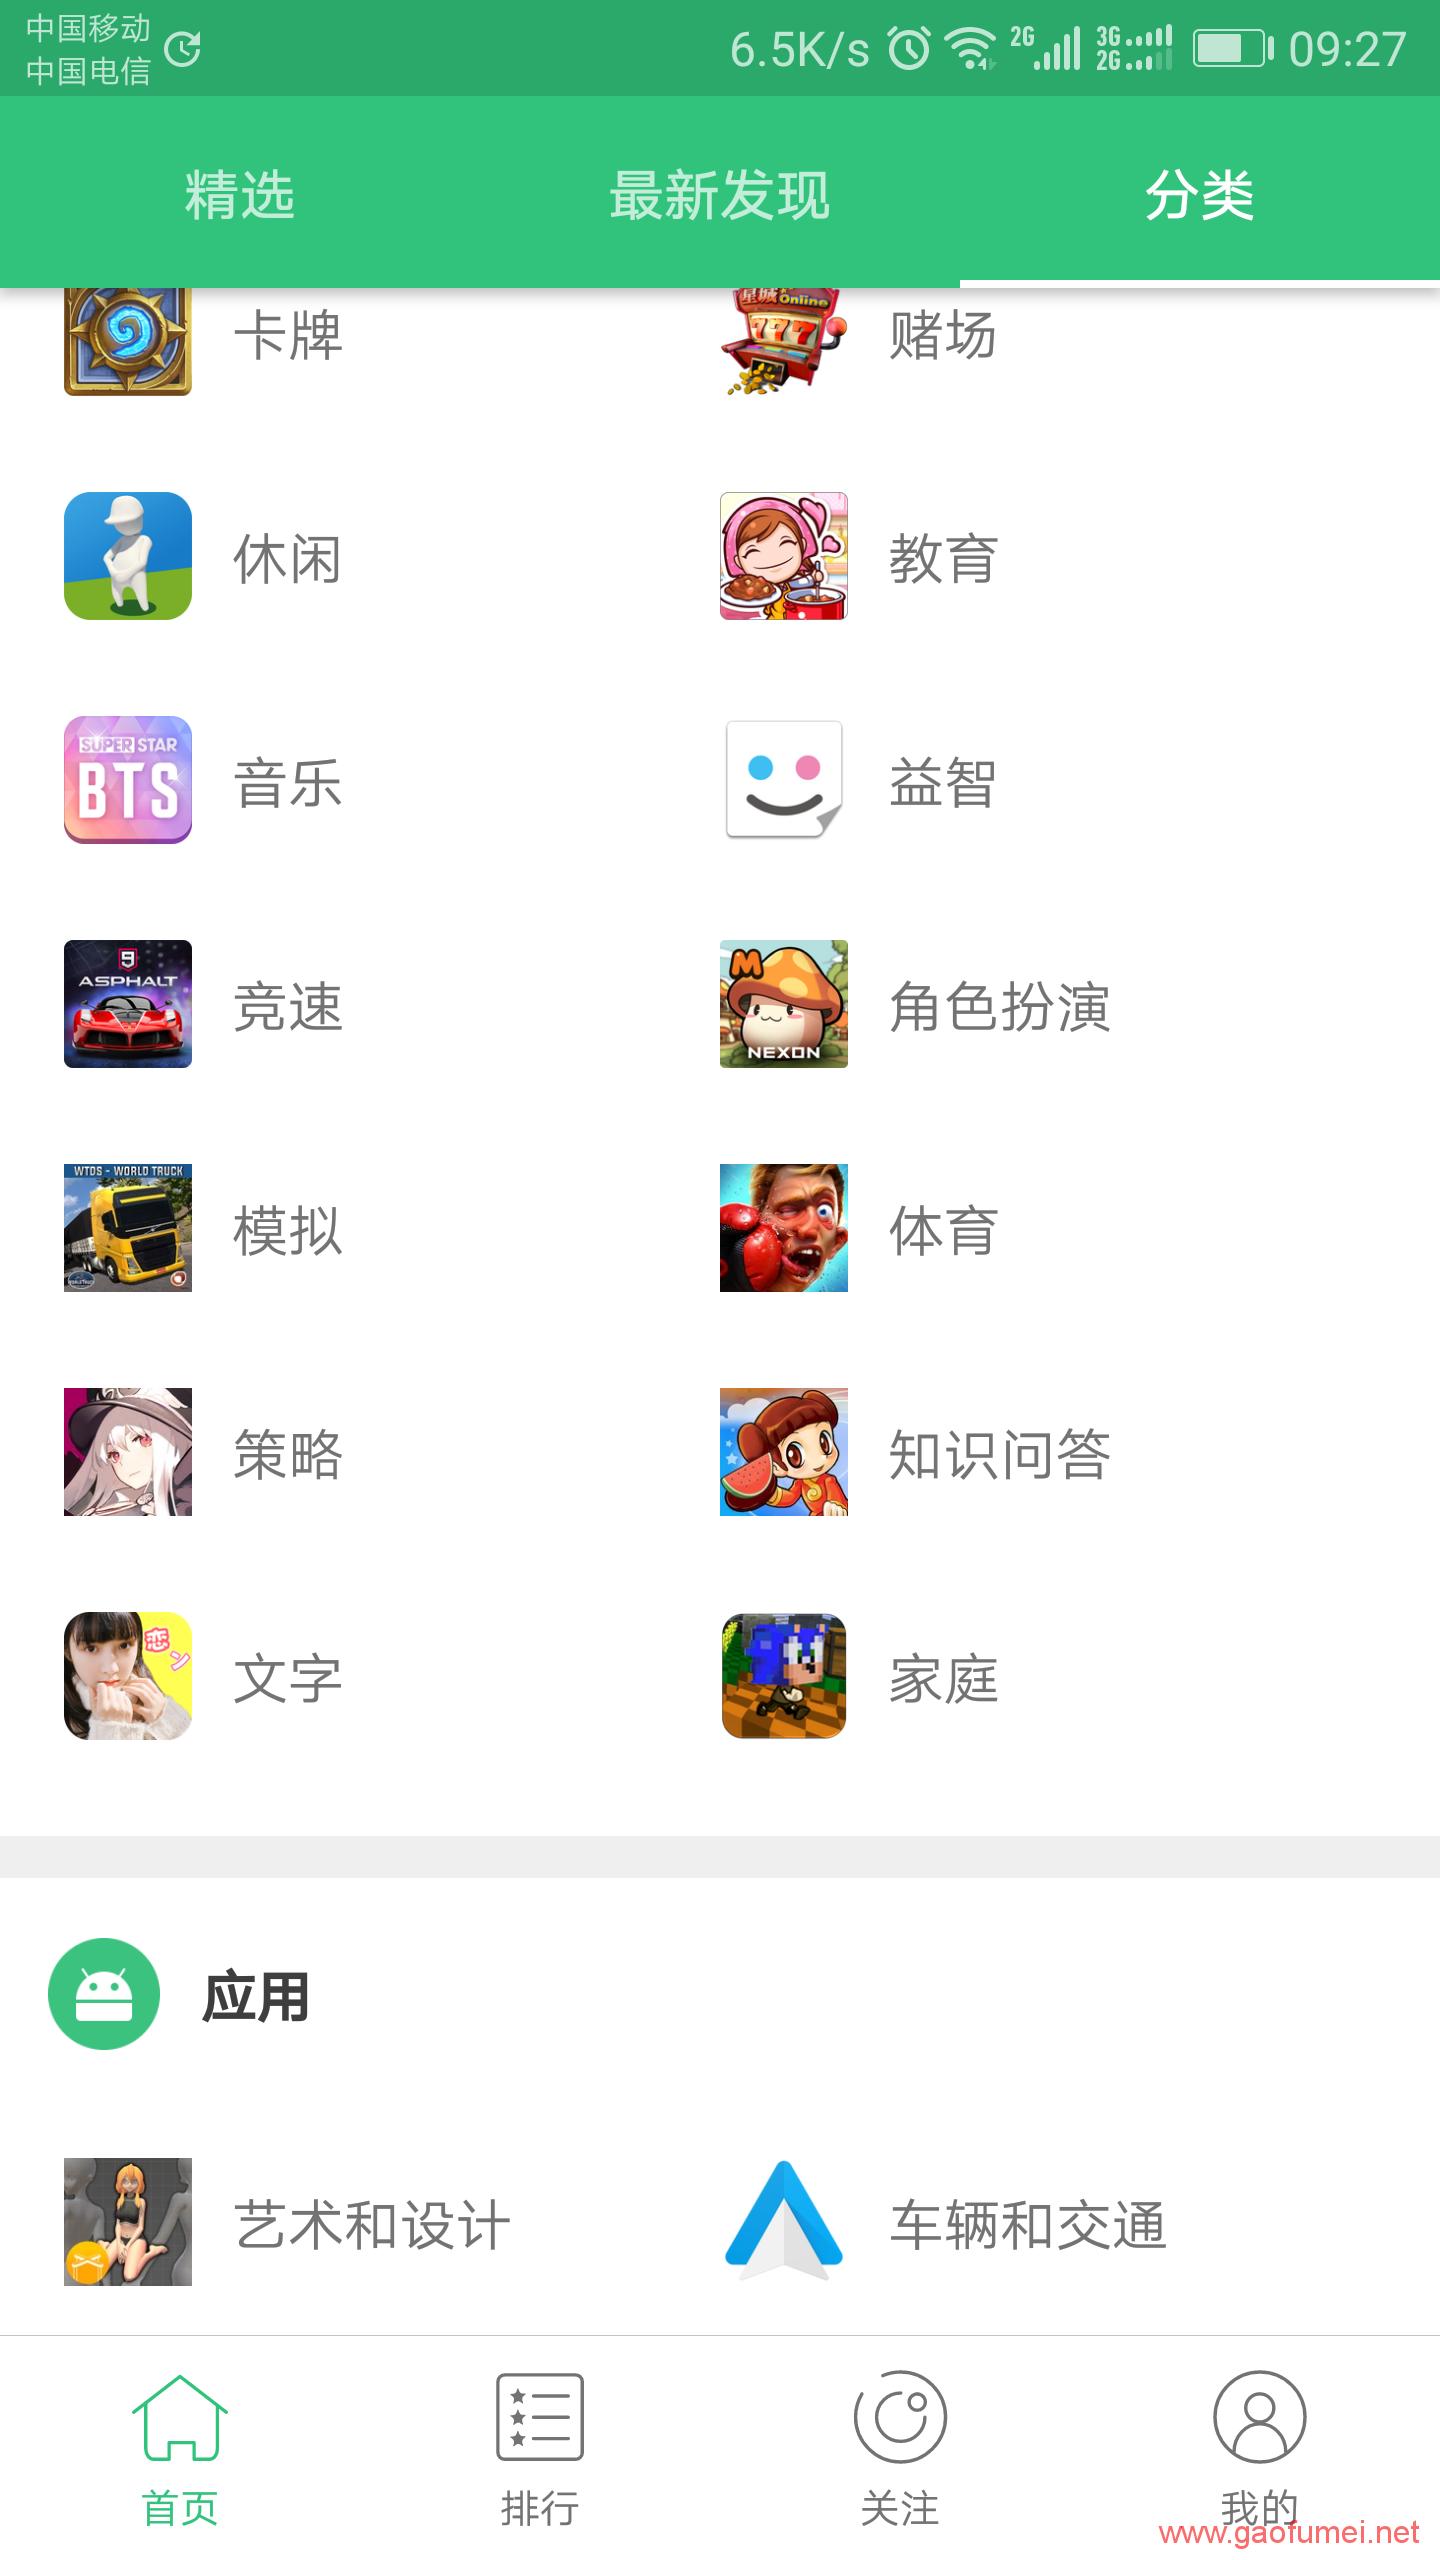 APKPure官方最新安卓版离线包免费下载